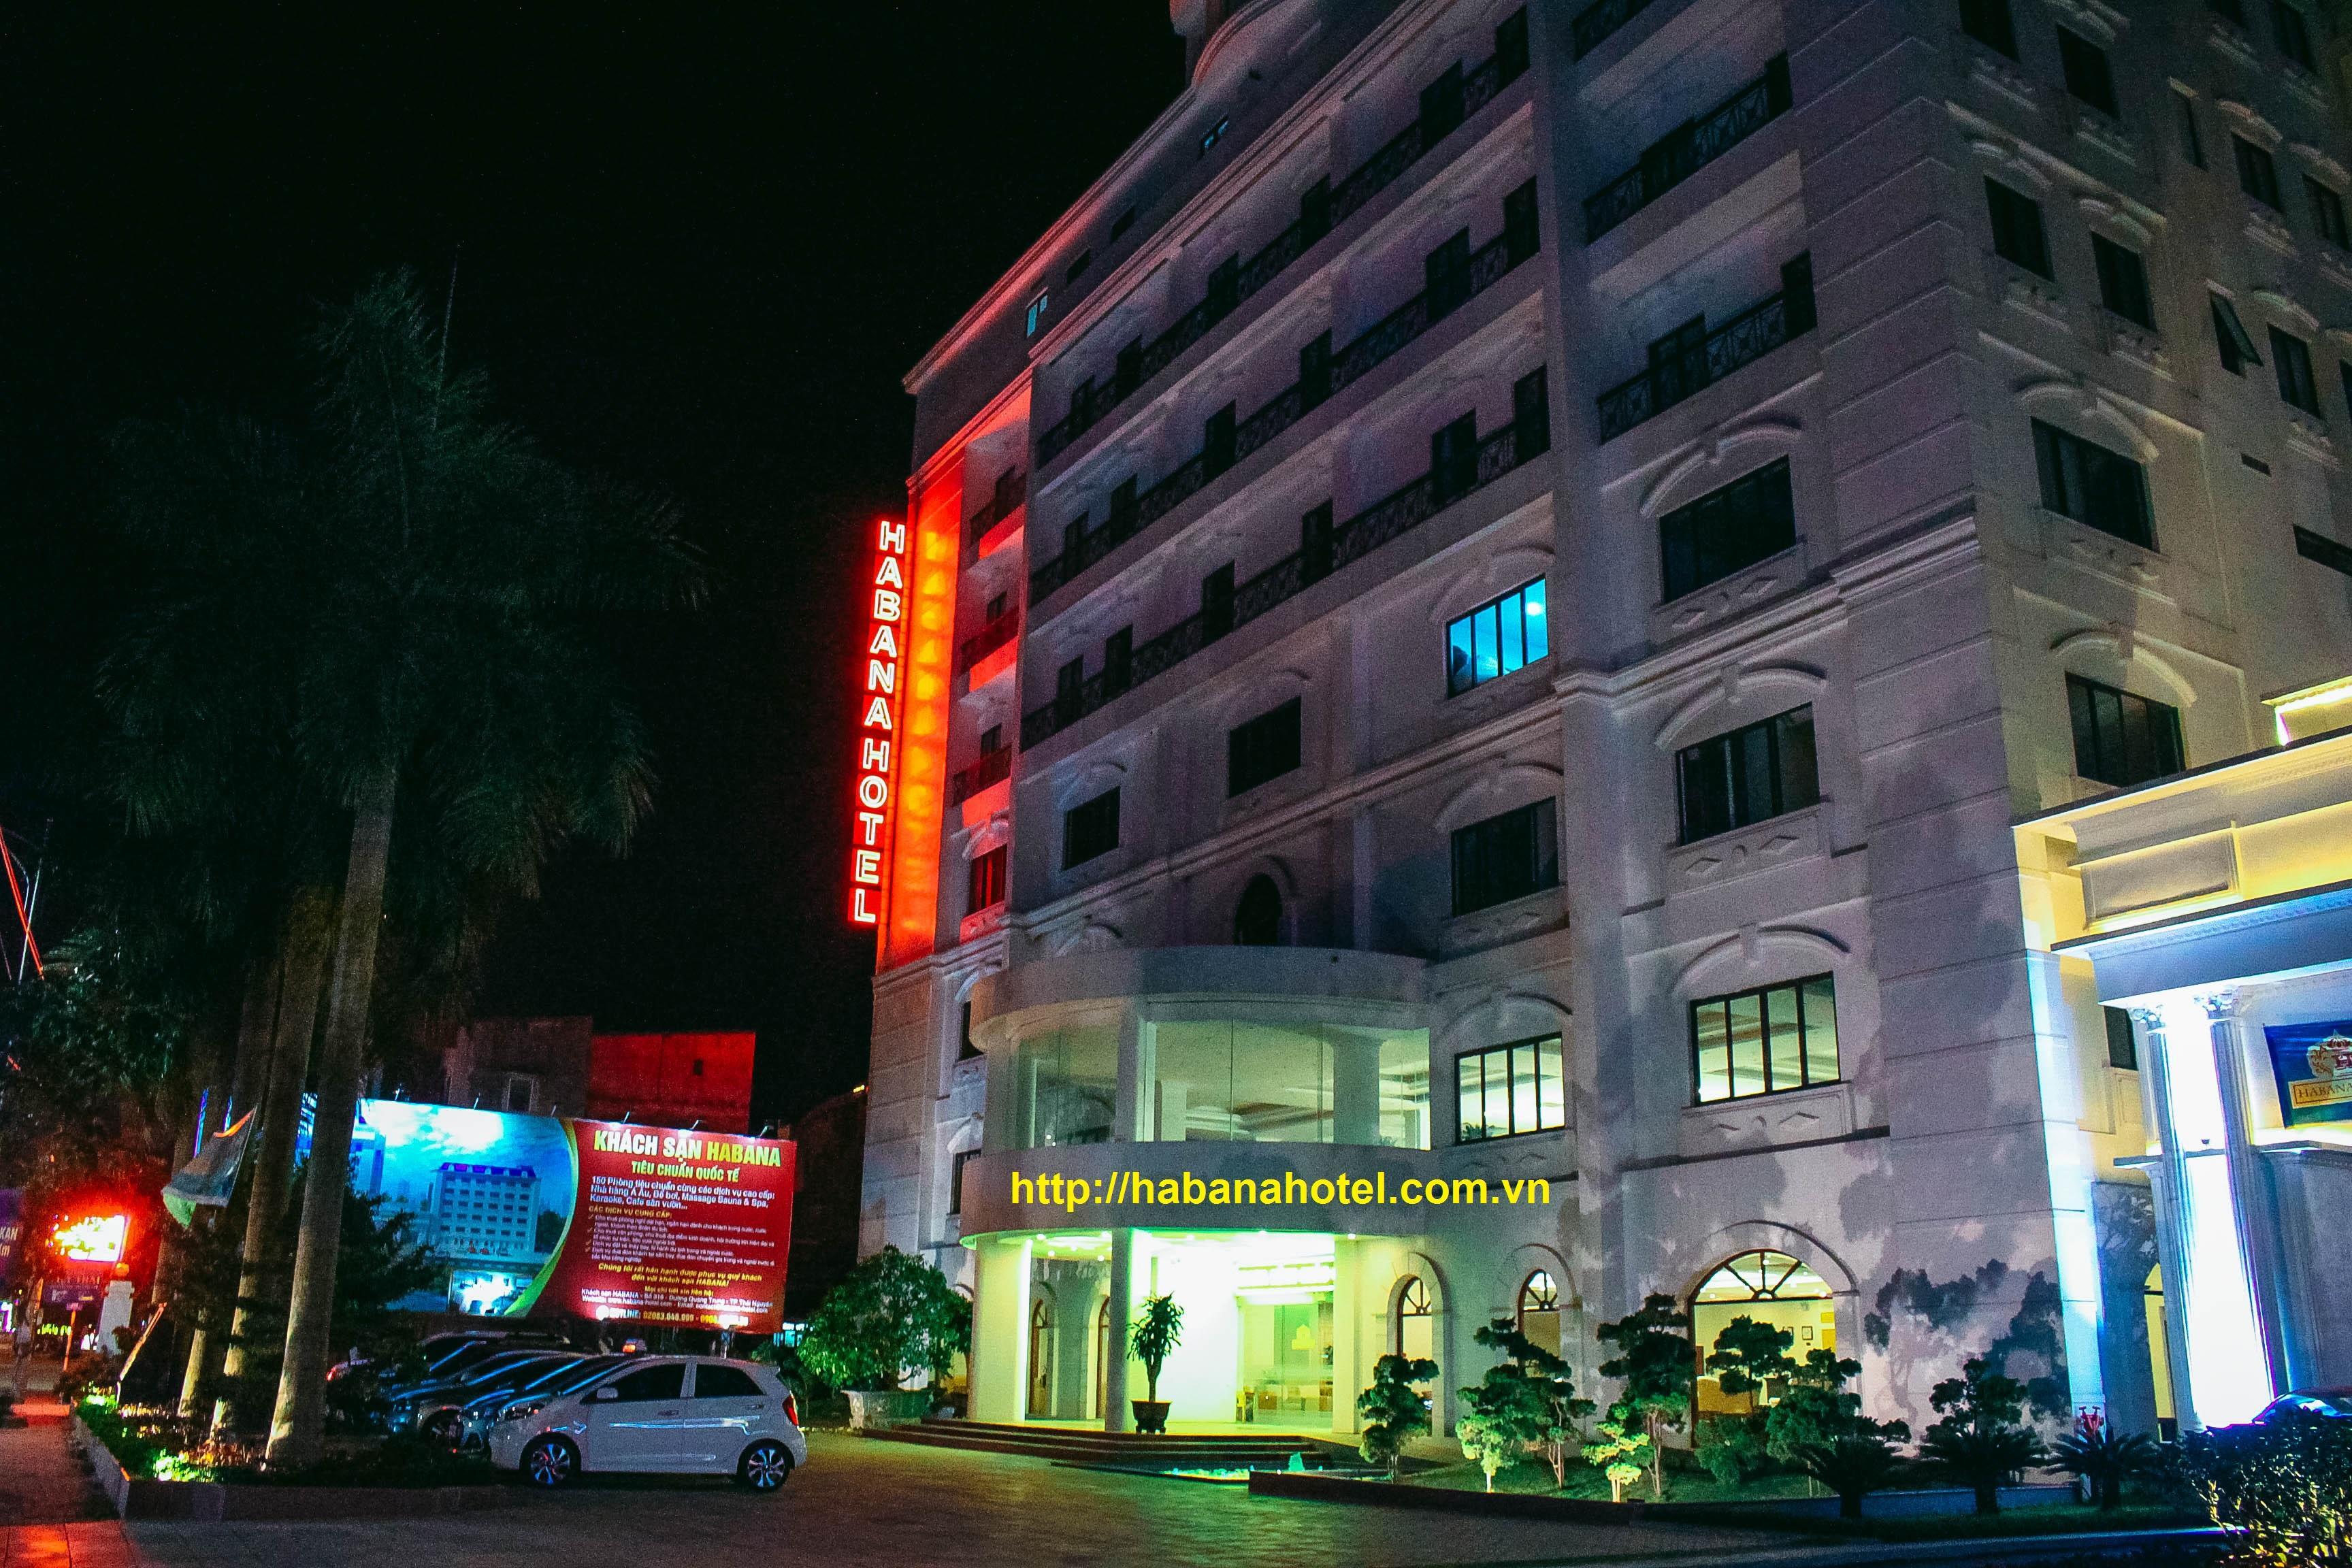 Habana Hotel